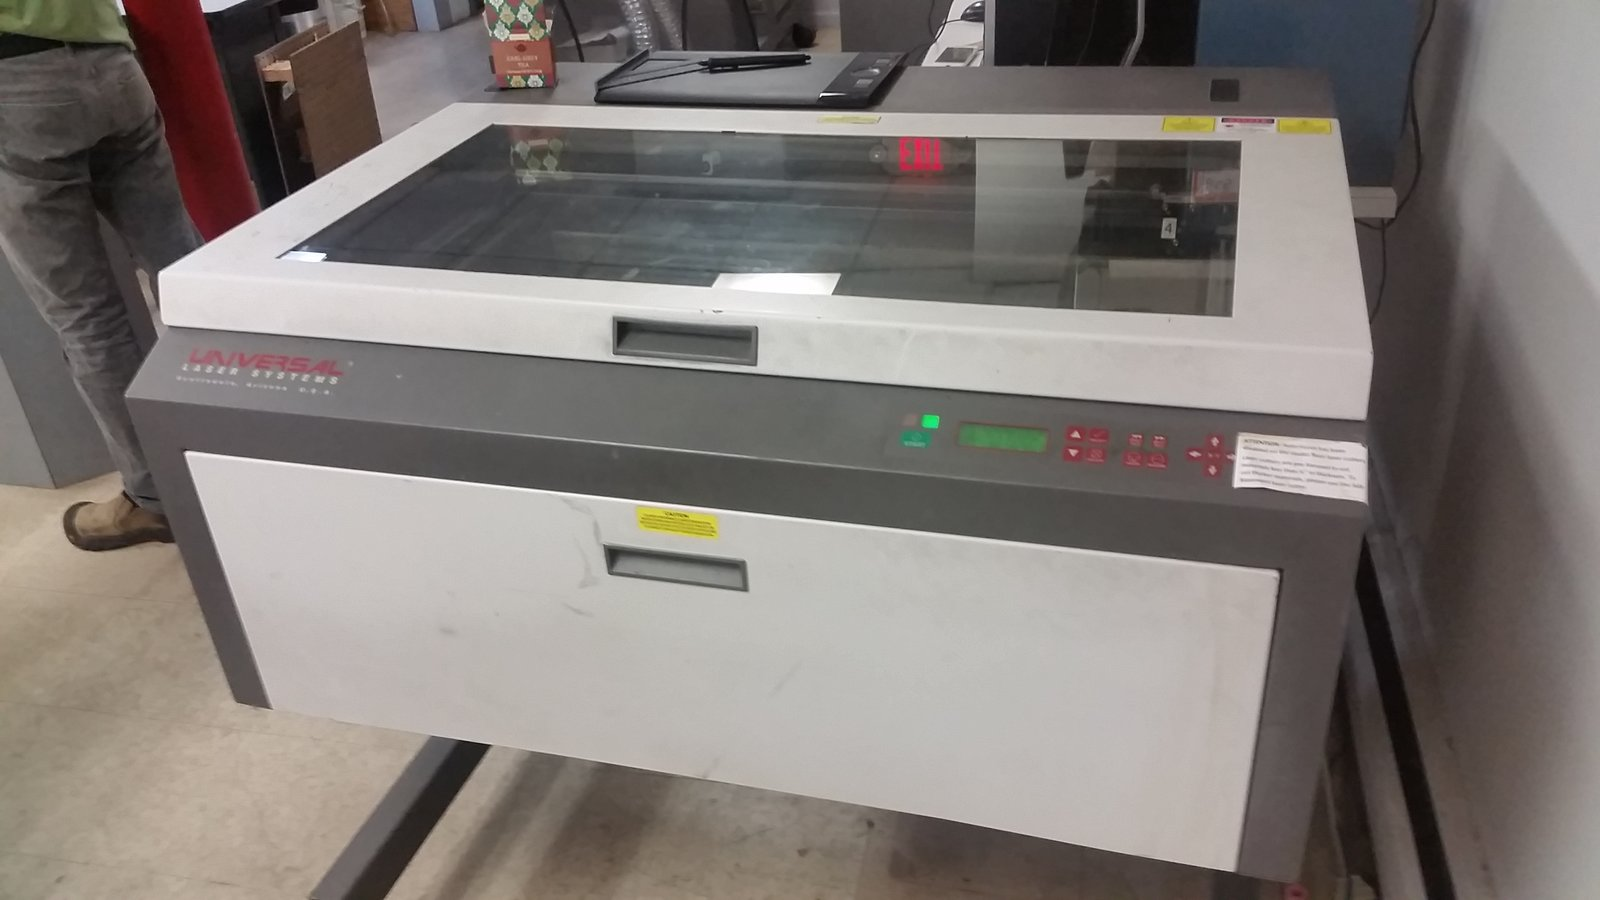 Laser Cutter 60 Watt Universal Laser Systems X2 Makehaven